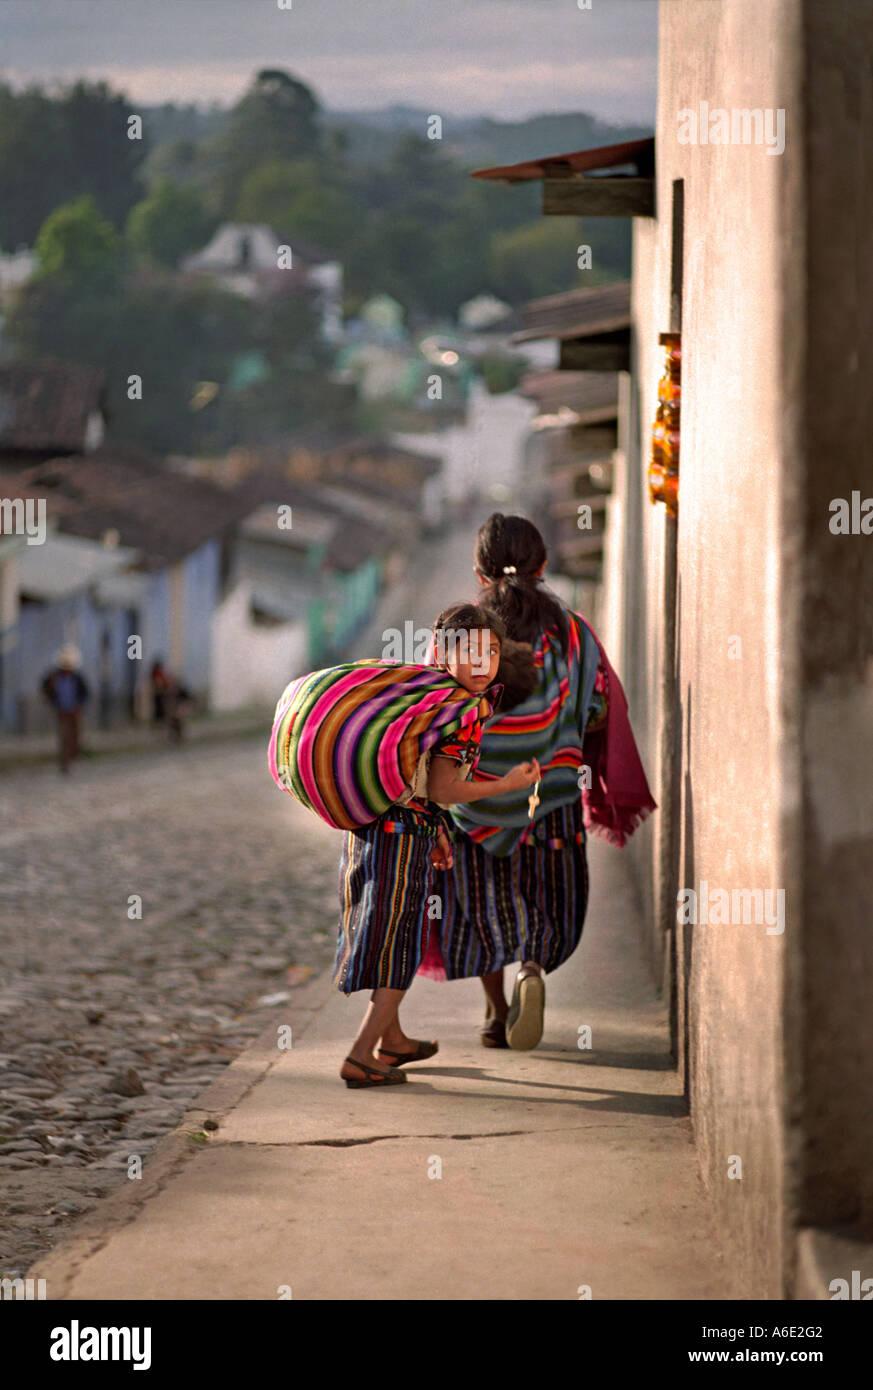 Guatemala Chichicastenango Young Maya girl in traditional village dress walking home Central America - Stock Image